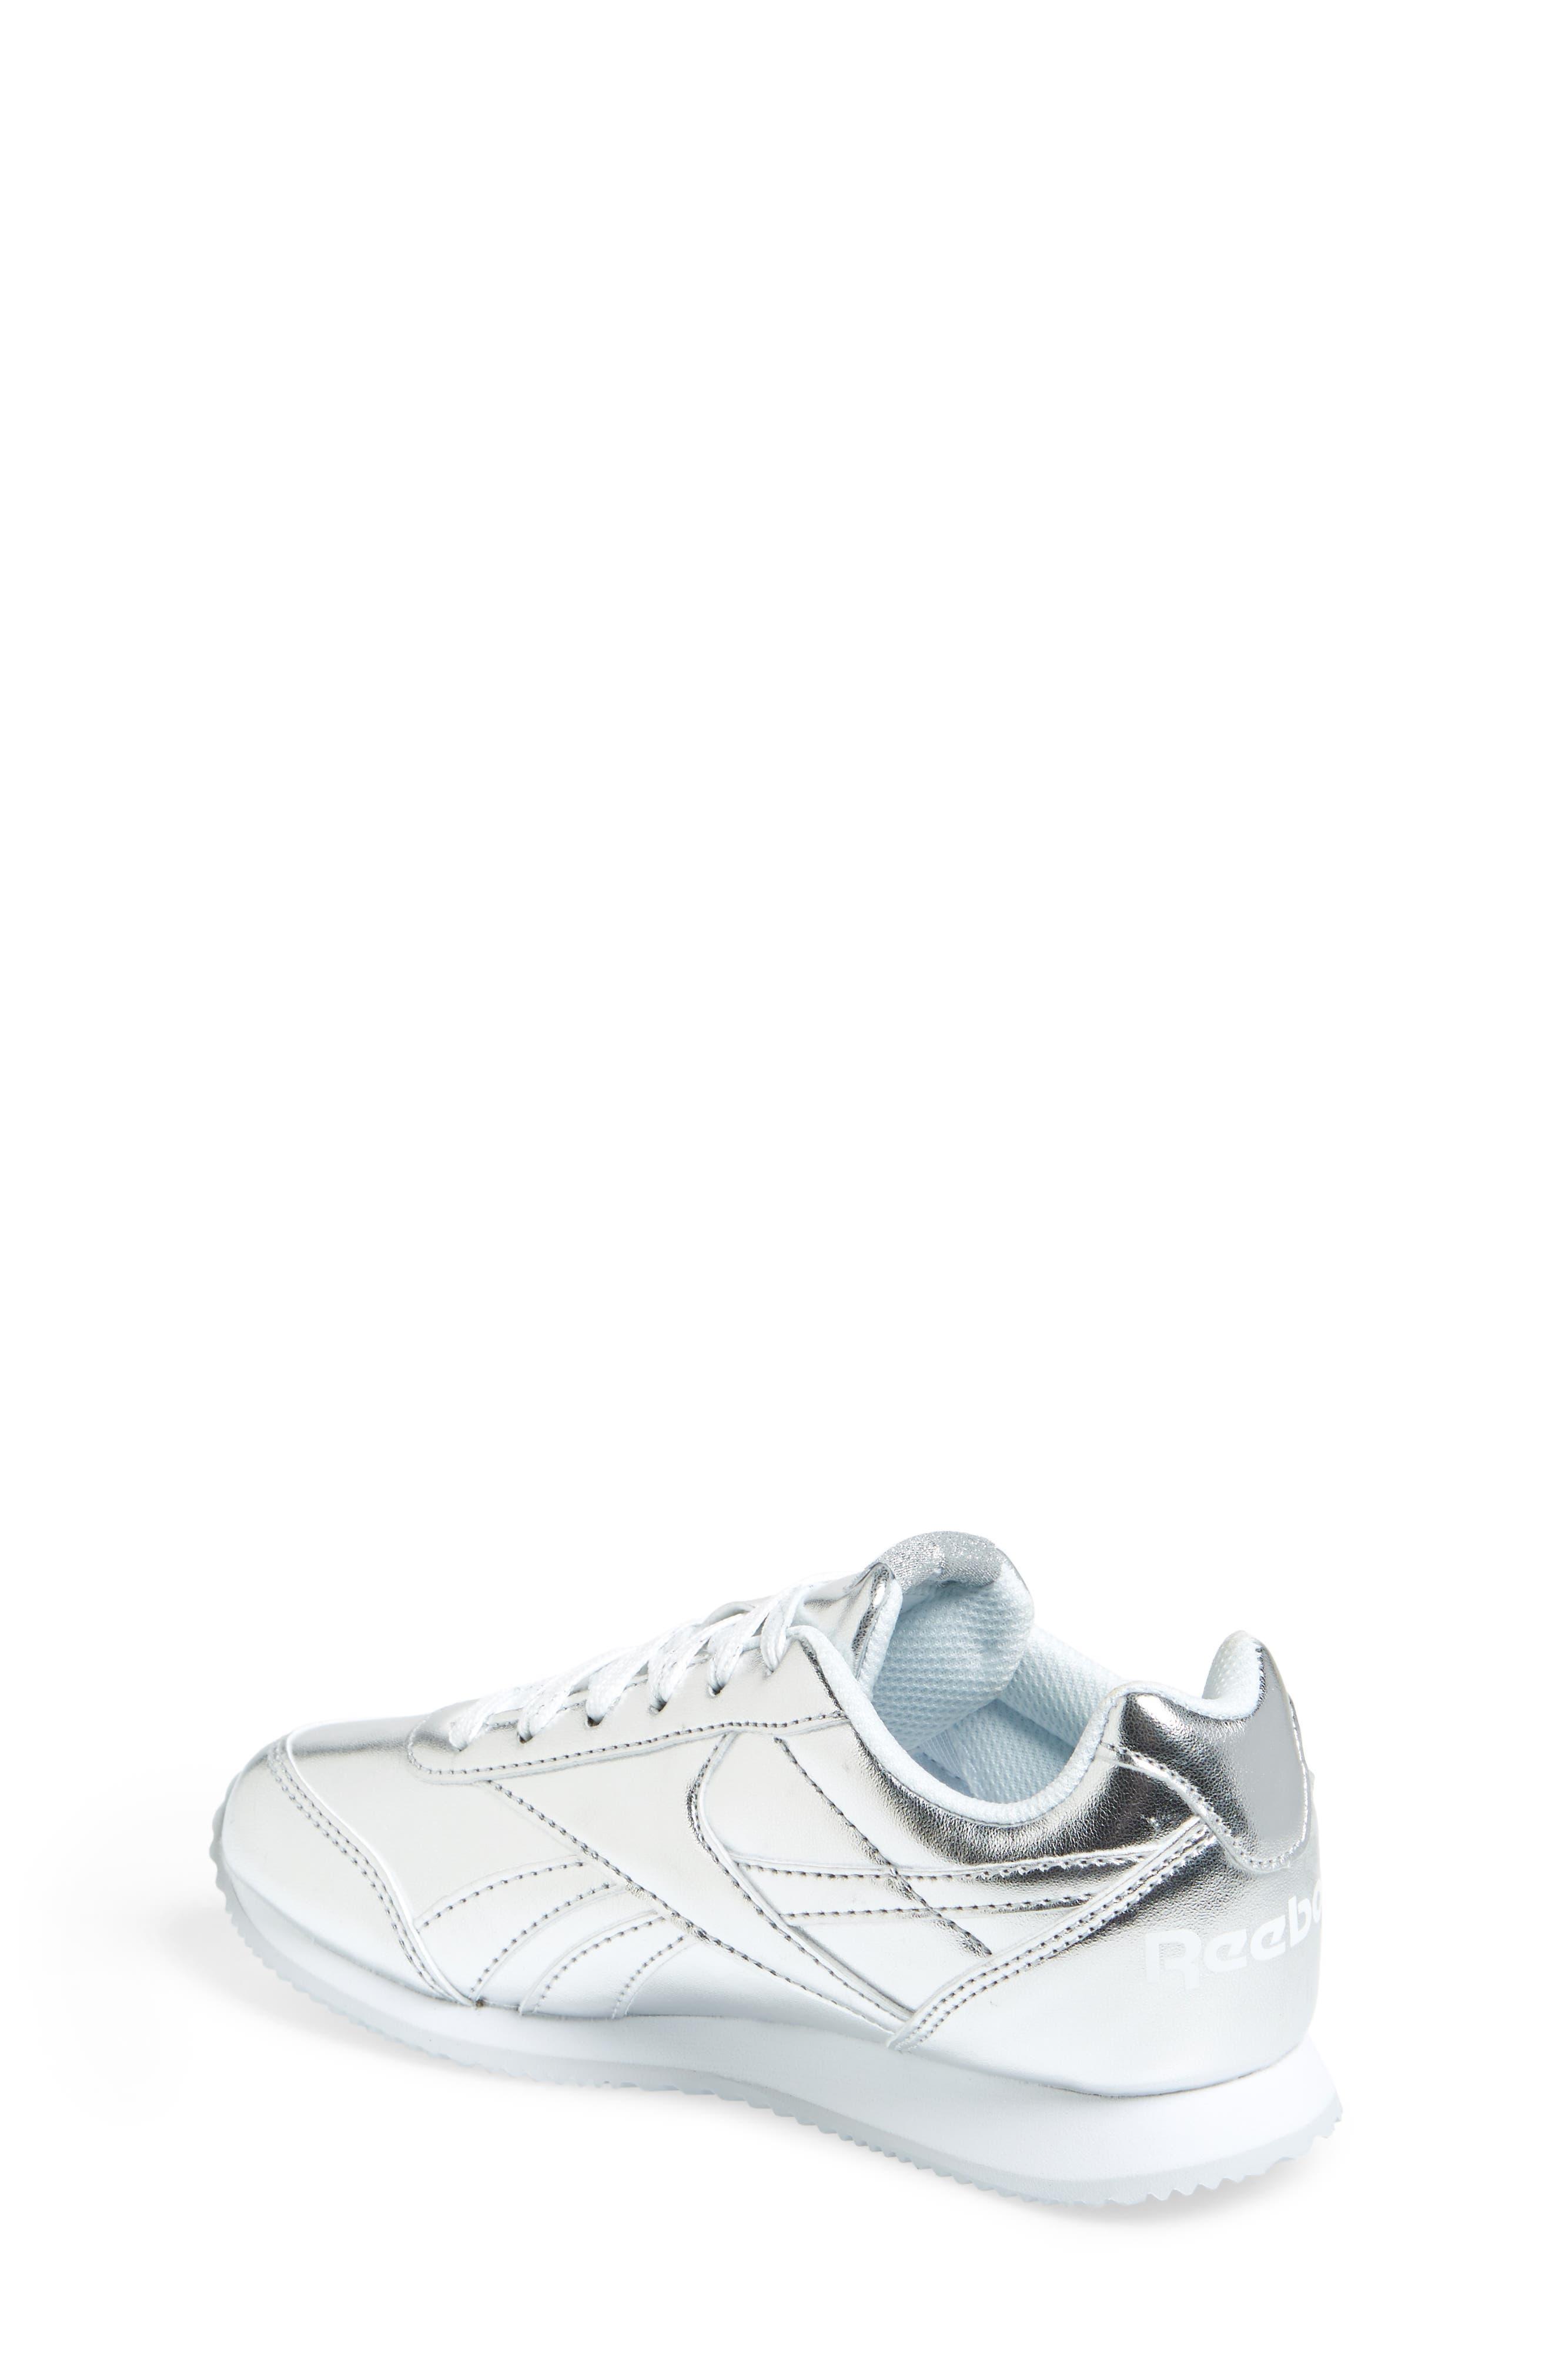 Royal Classic Jogger 2.0 Sneaker,                             Alternate thumbnail 2, color,                             040